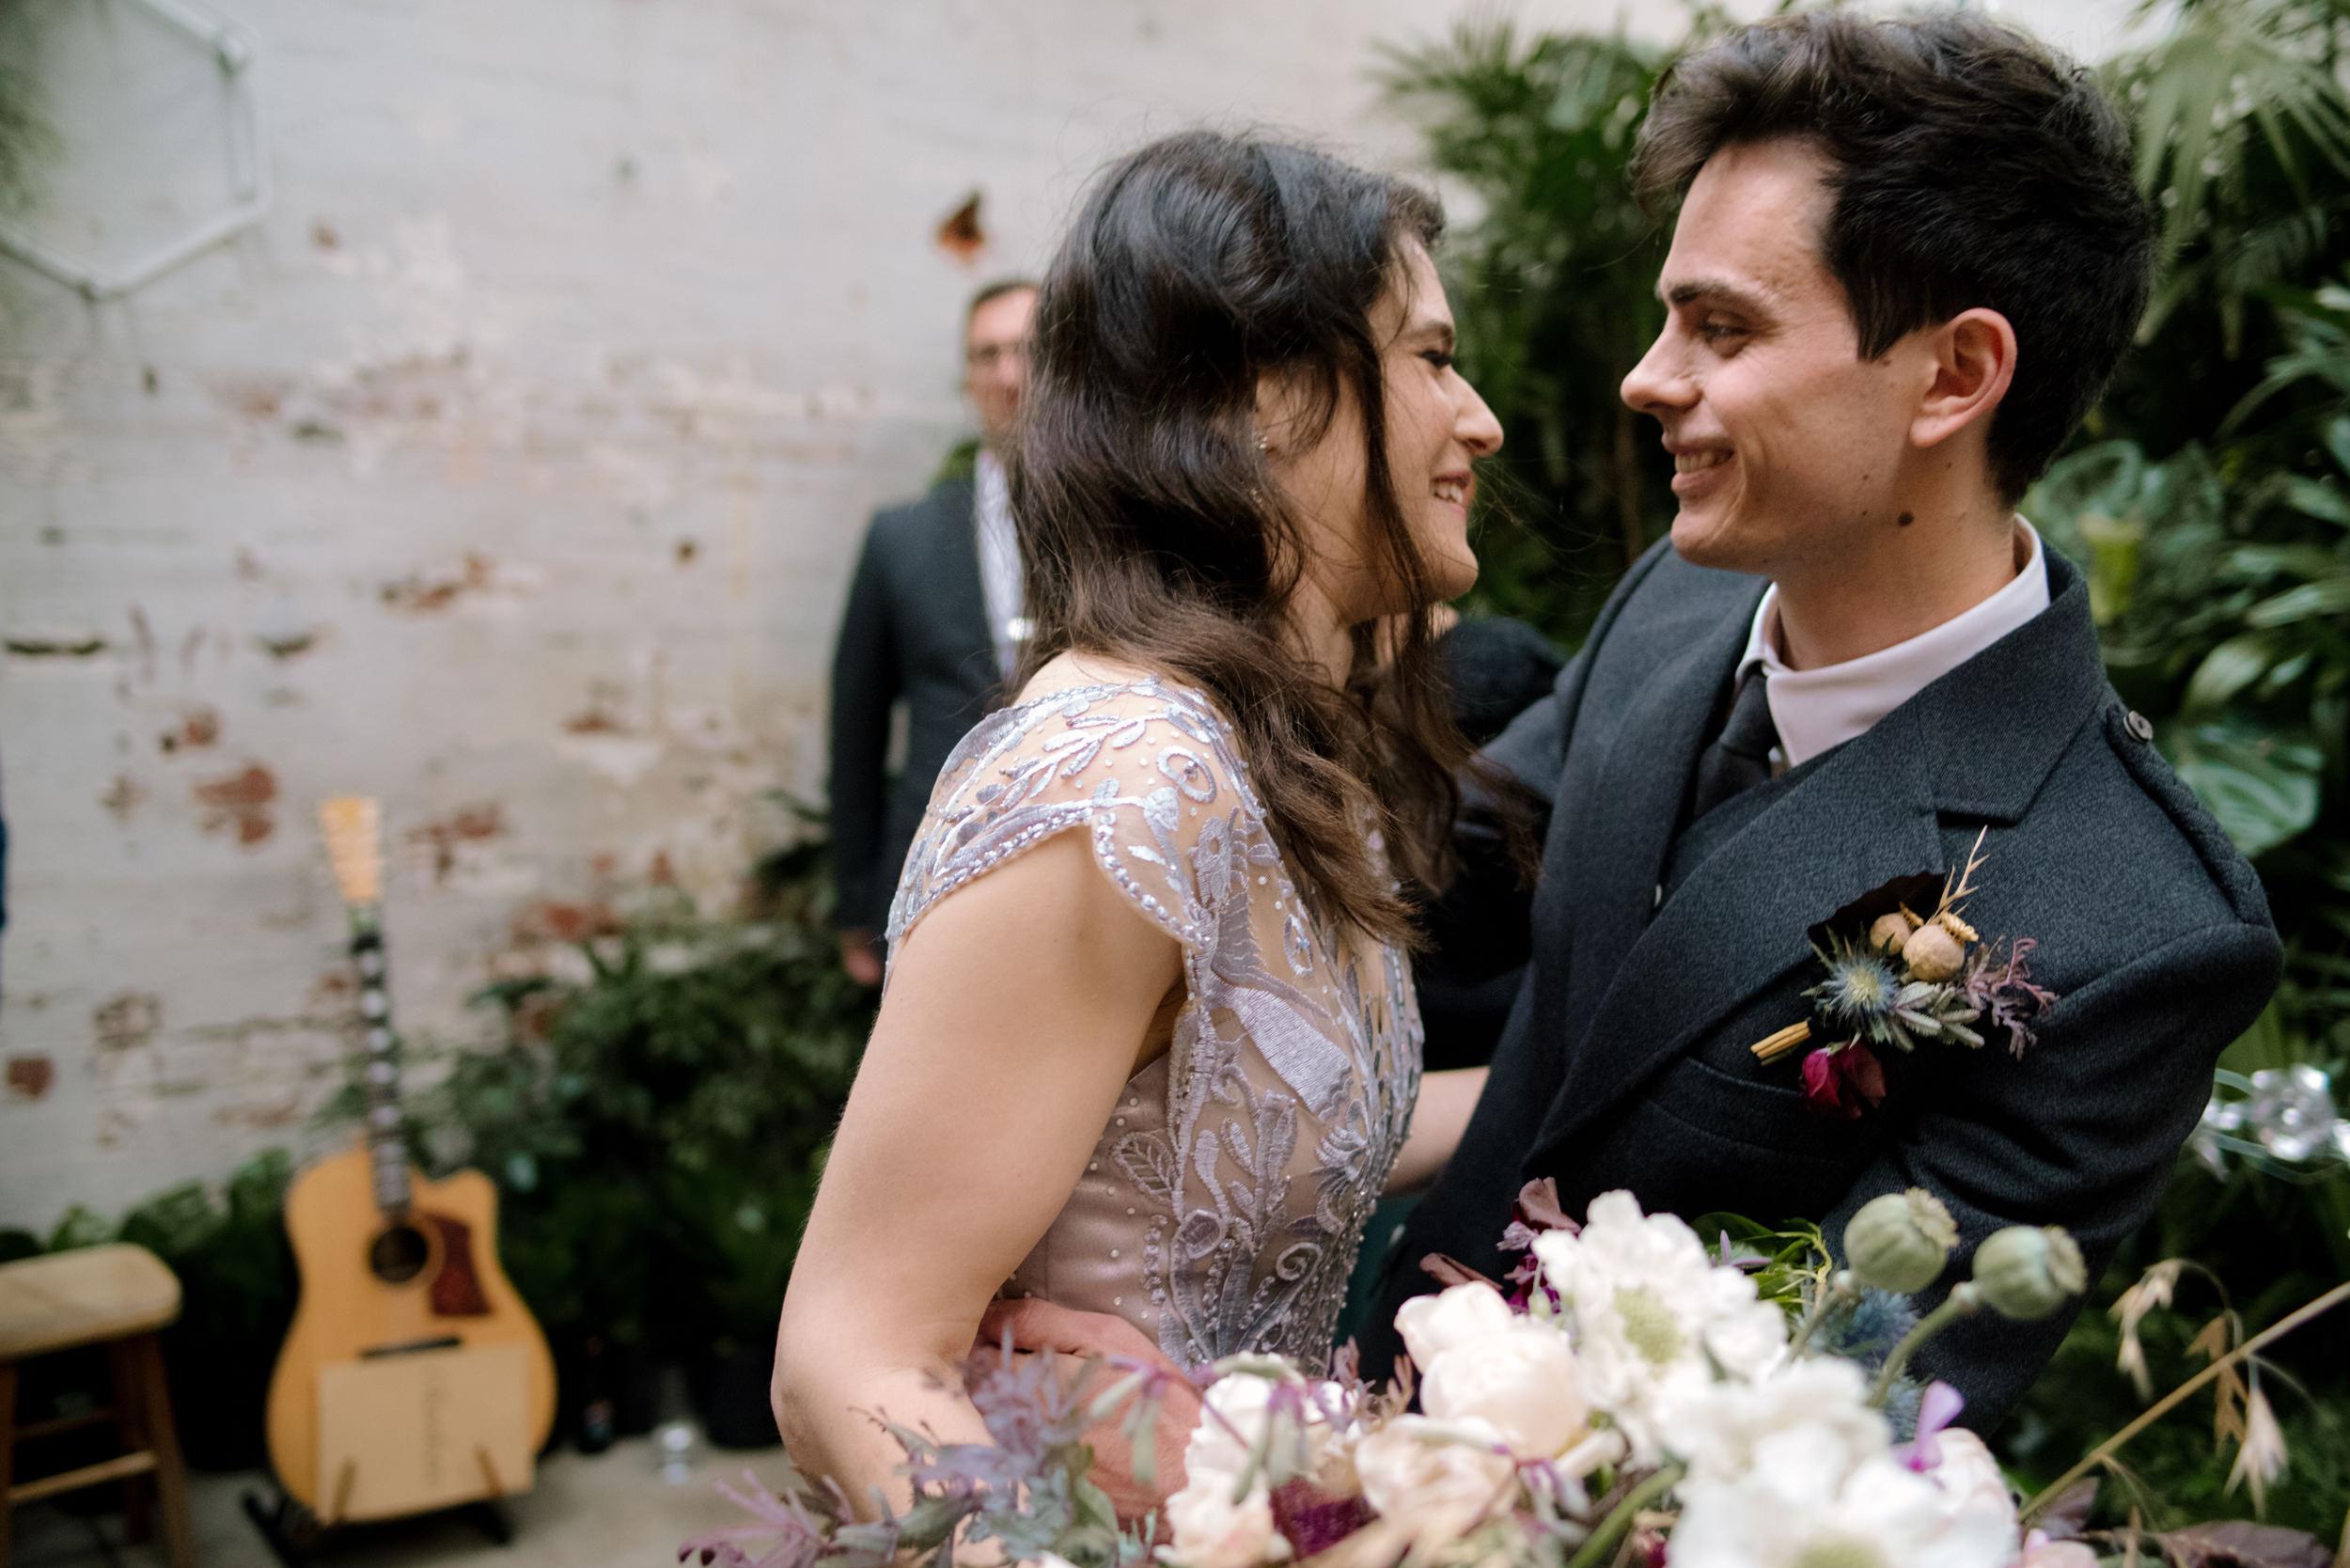 I-Got-You-Babe-&.Co.-Glasshaus-Wedding-Charlotte-Cameron0062.JPG